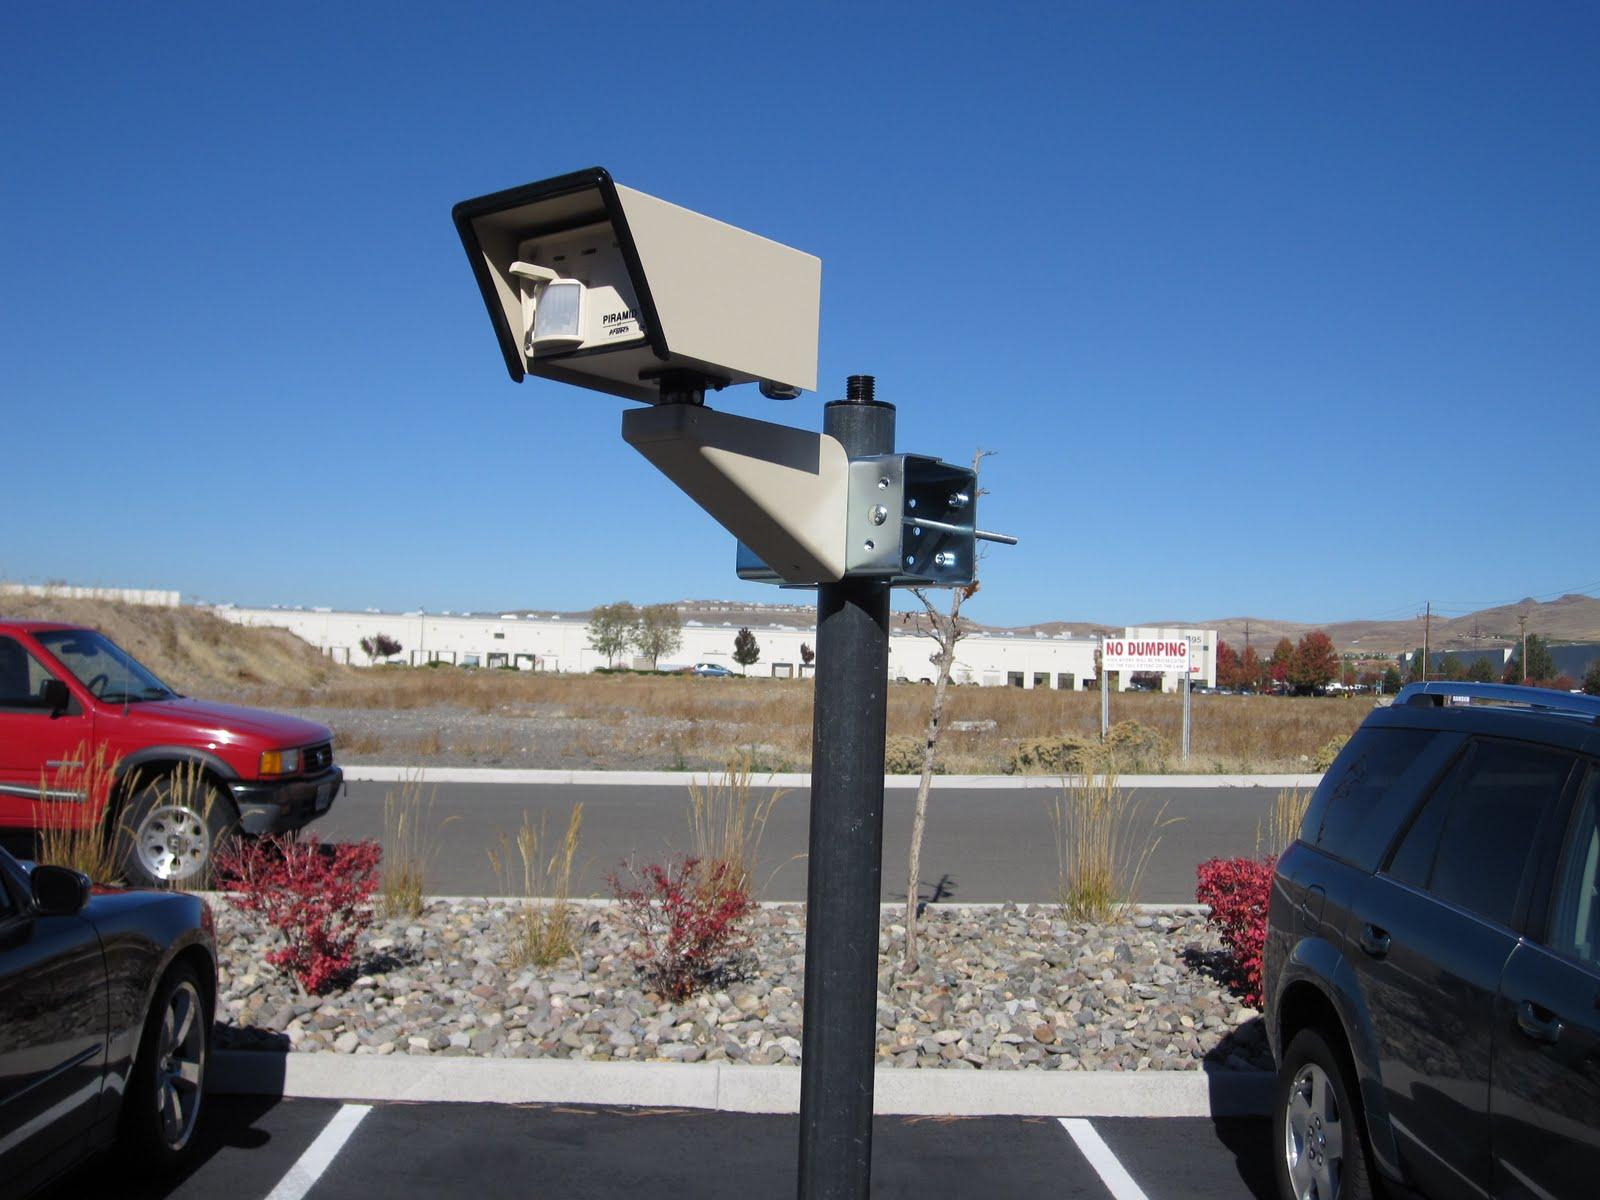 Commercial Outdoor Perimeter Alarms